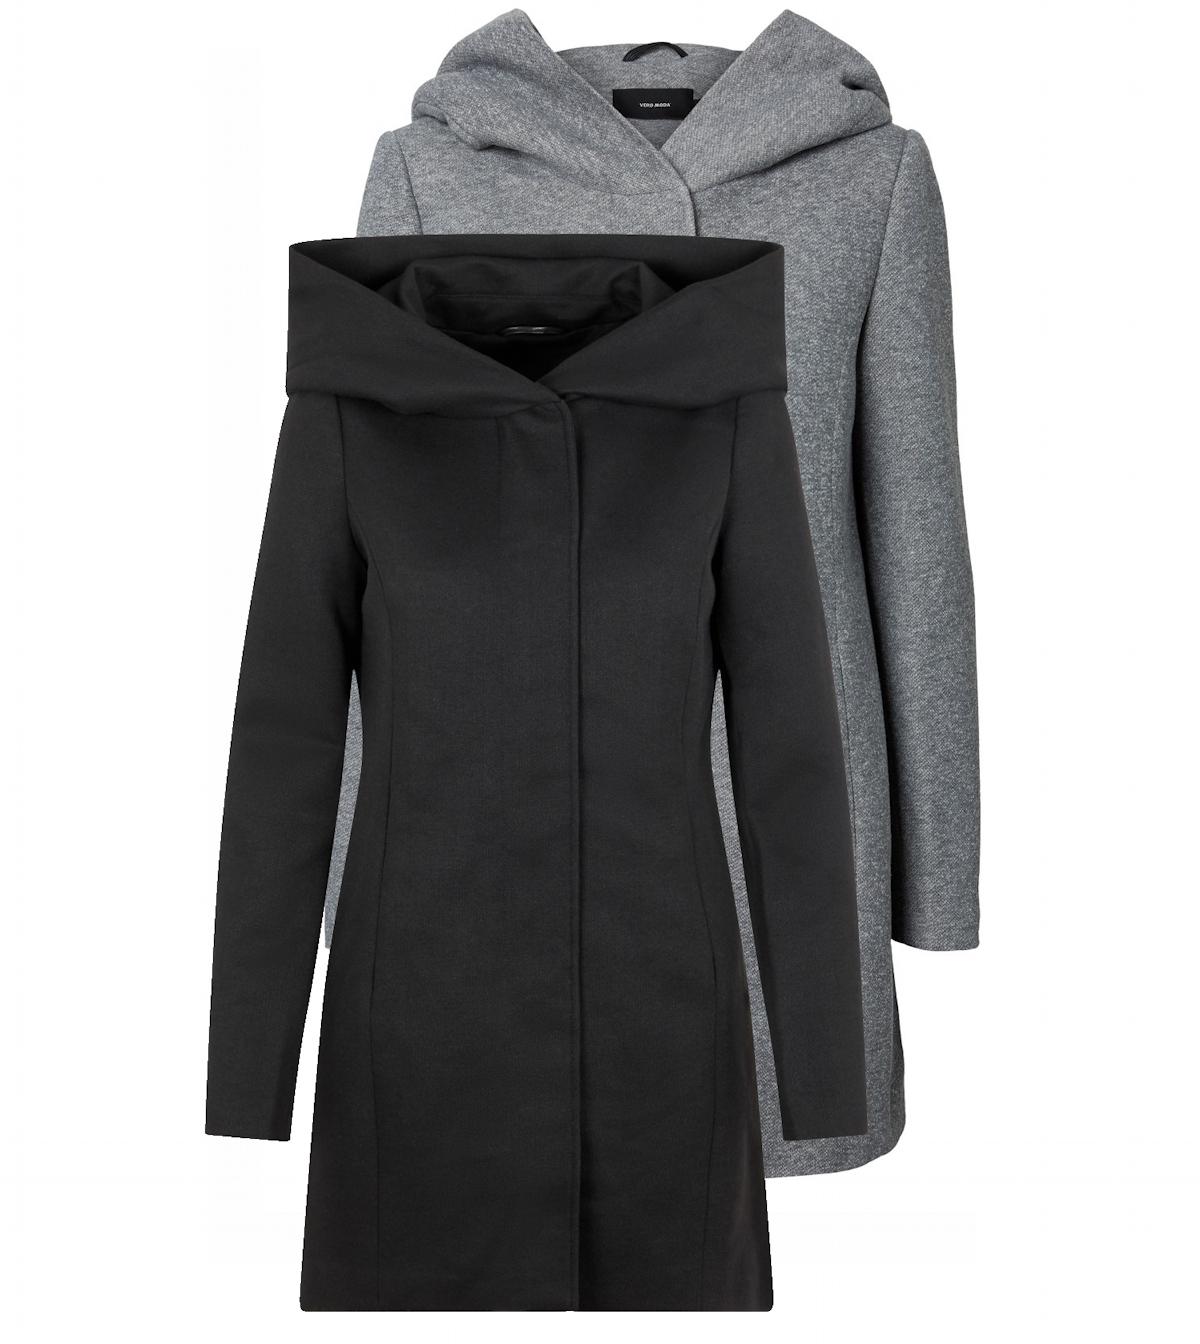 Vero Moda Damenjacke Jacke Mantel Wolljacke Winterjacke Kurzmantel Color Mix